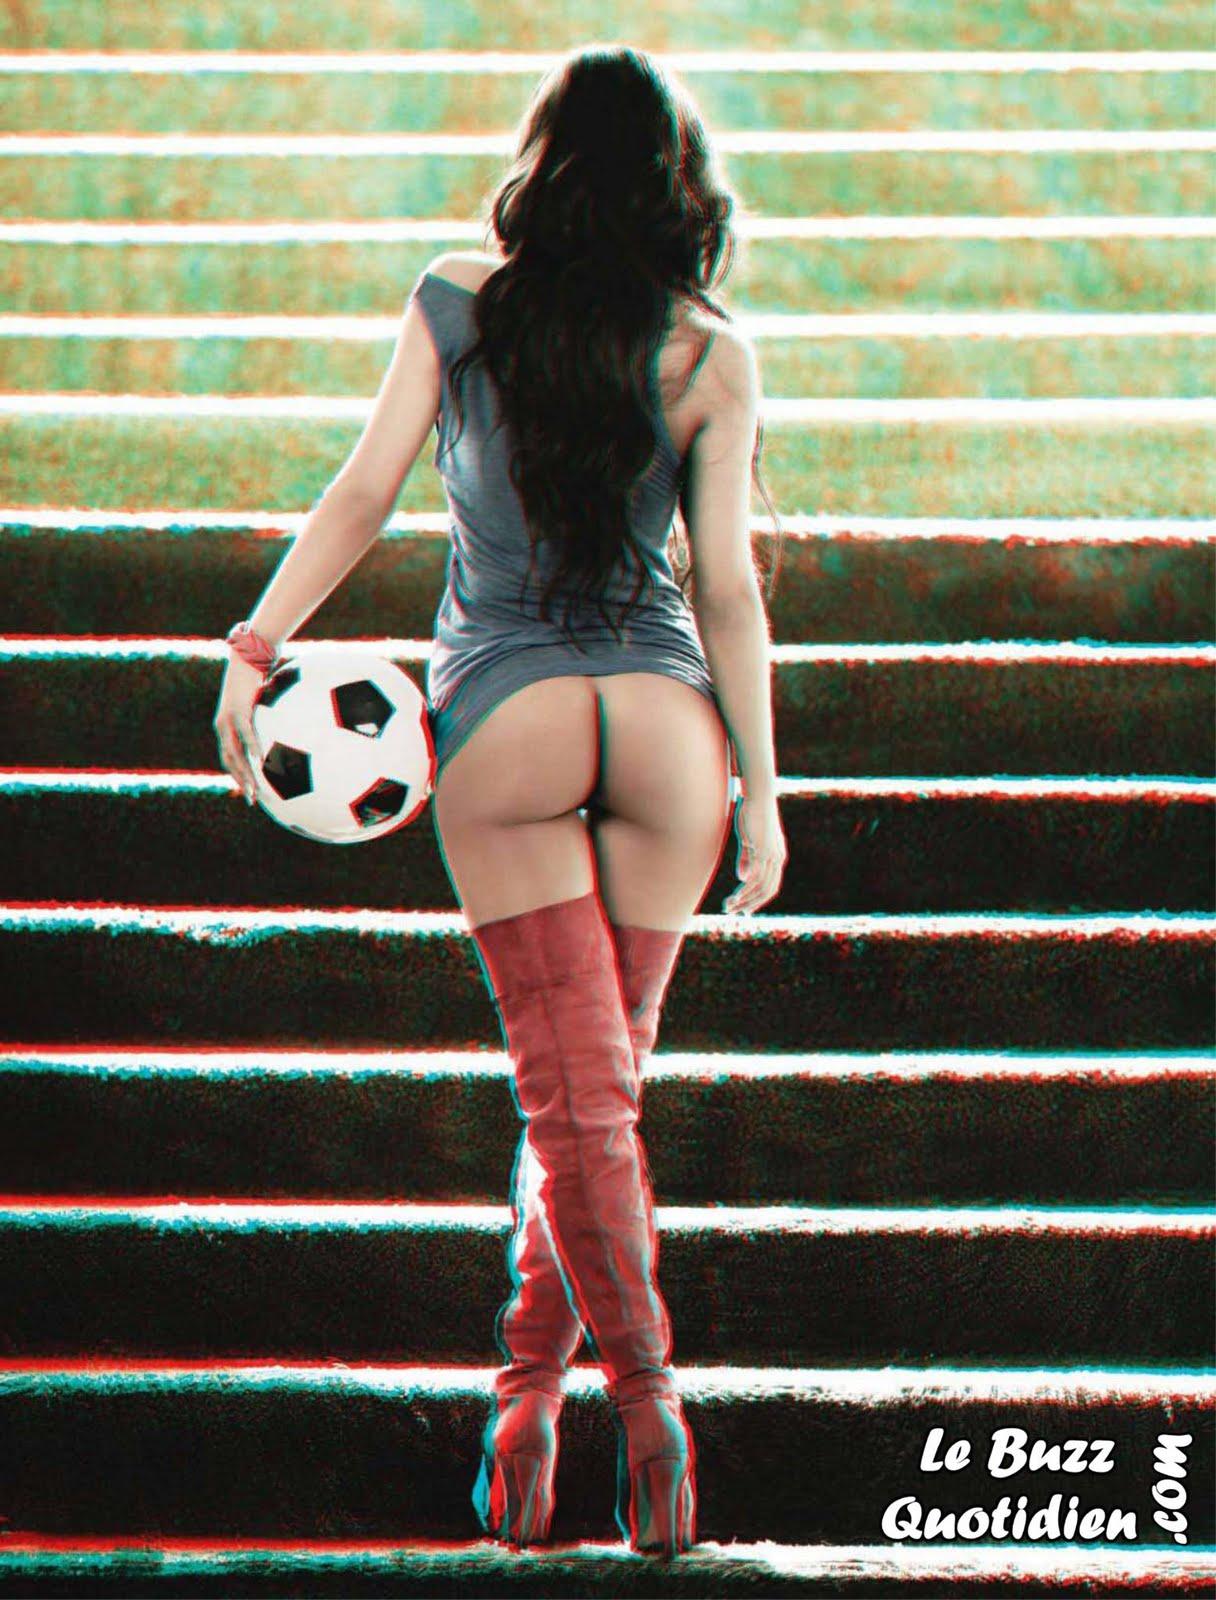 Larissa Riquelme nue 3D Playboy,Larissa Riquelme nude 3D Playboy,Larissa Riquelme naked 3D Playboy